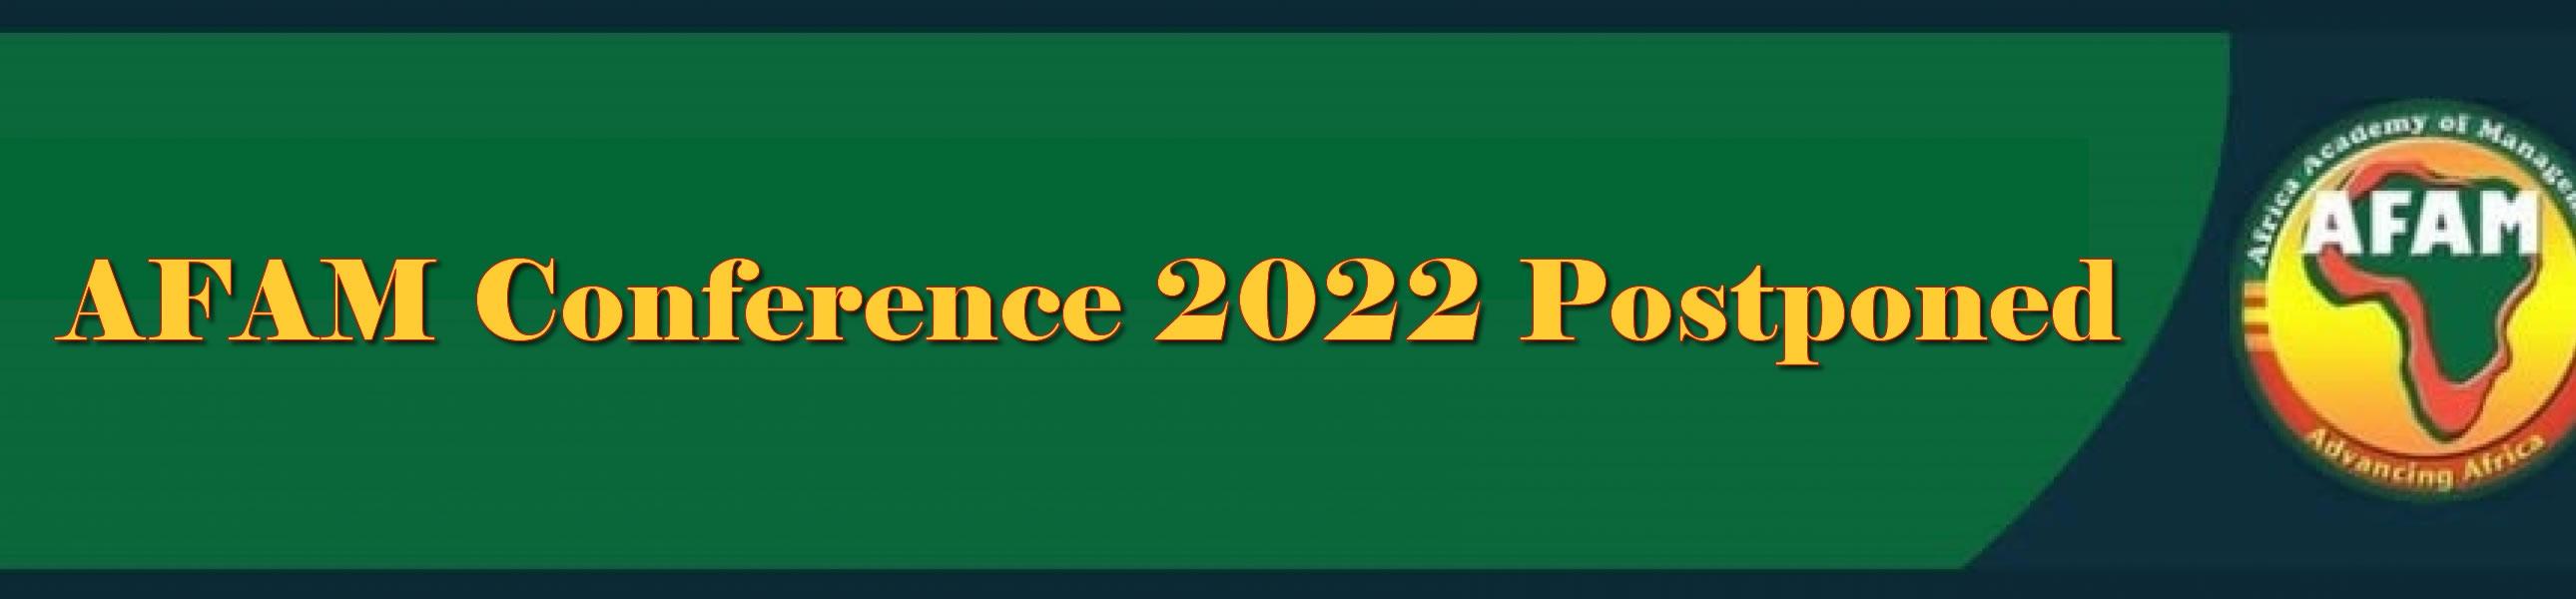 AFAM Biennial Conference 2022 Postponed